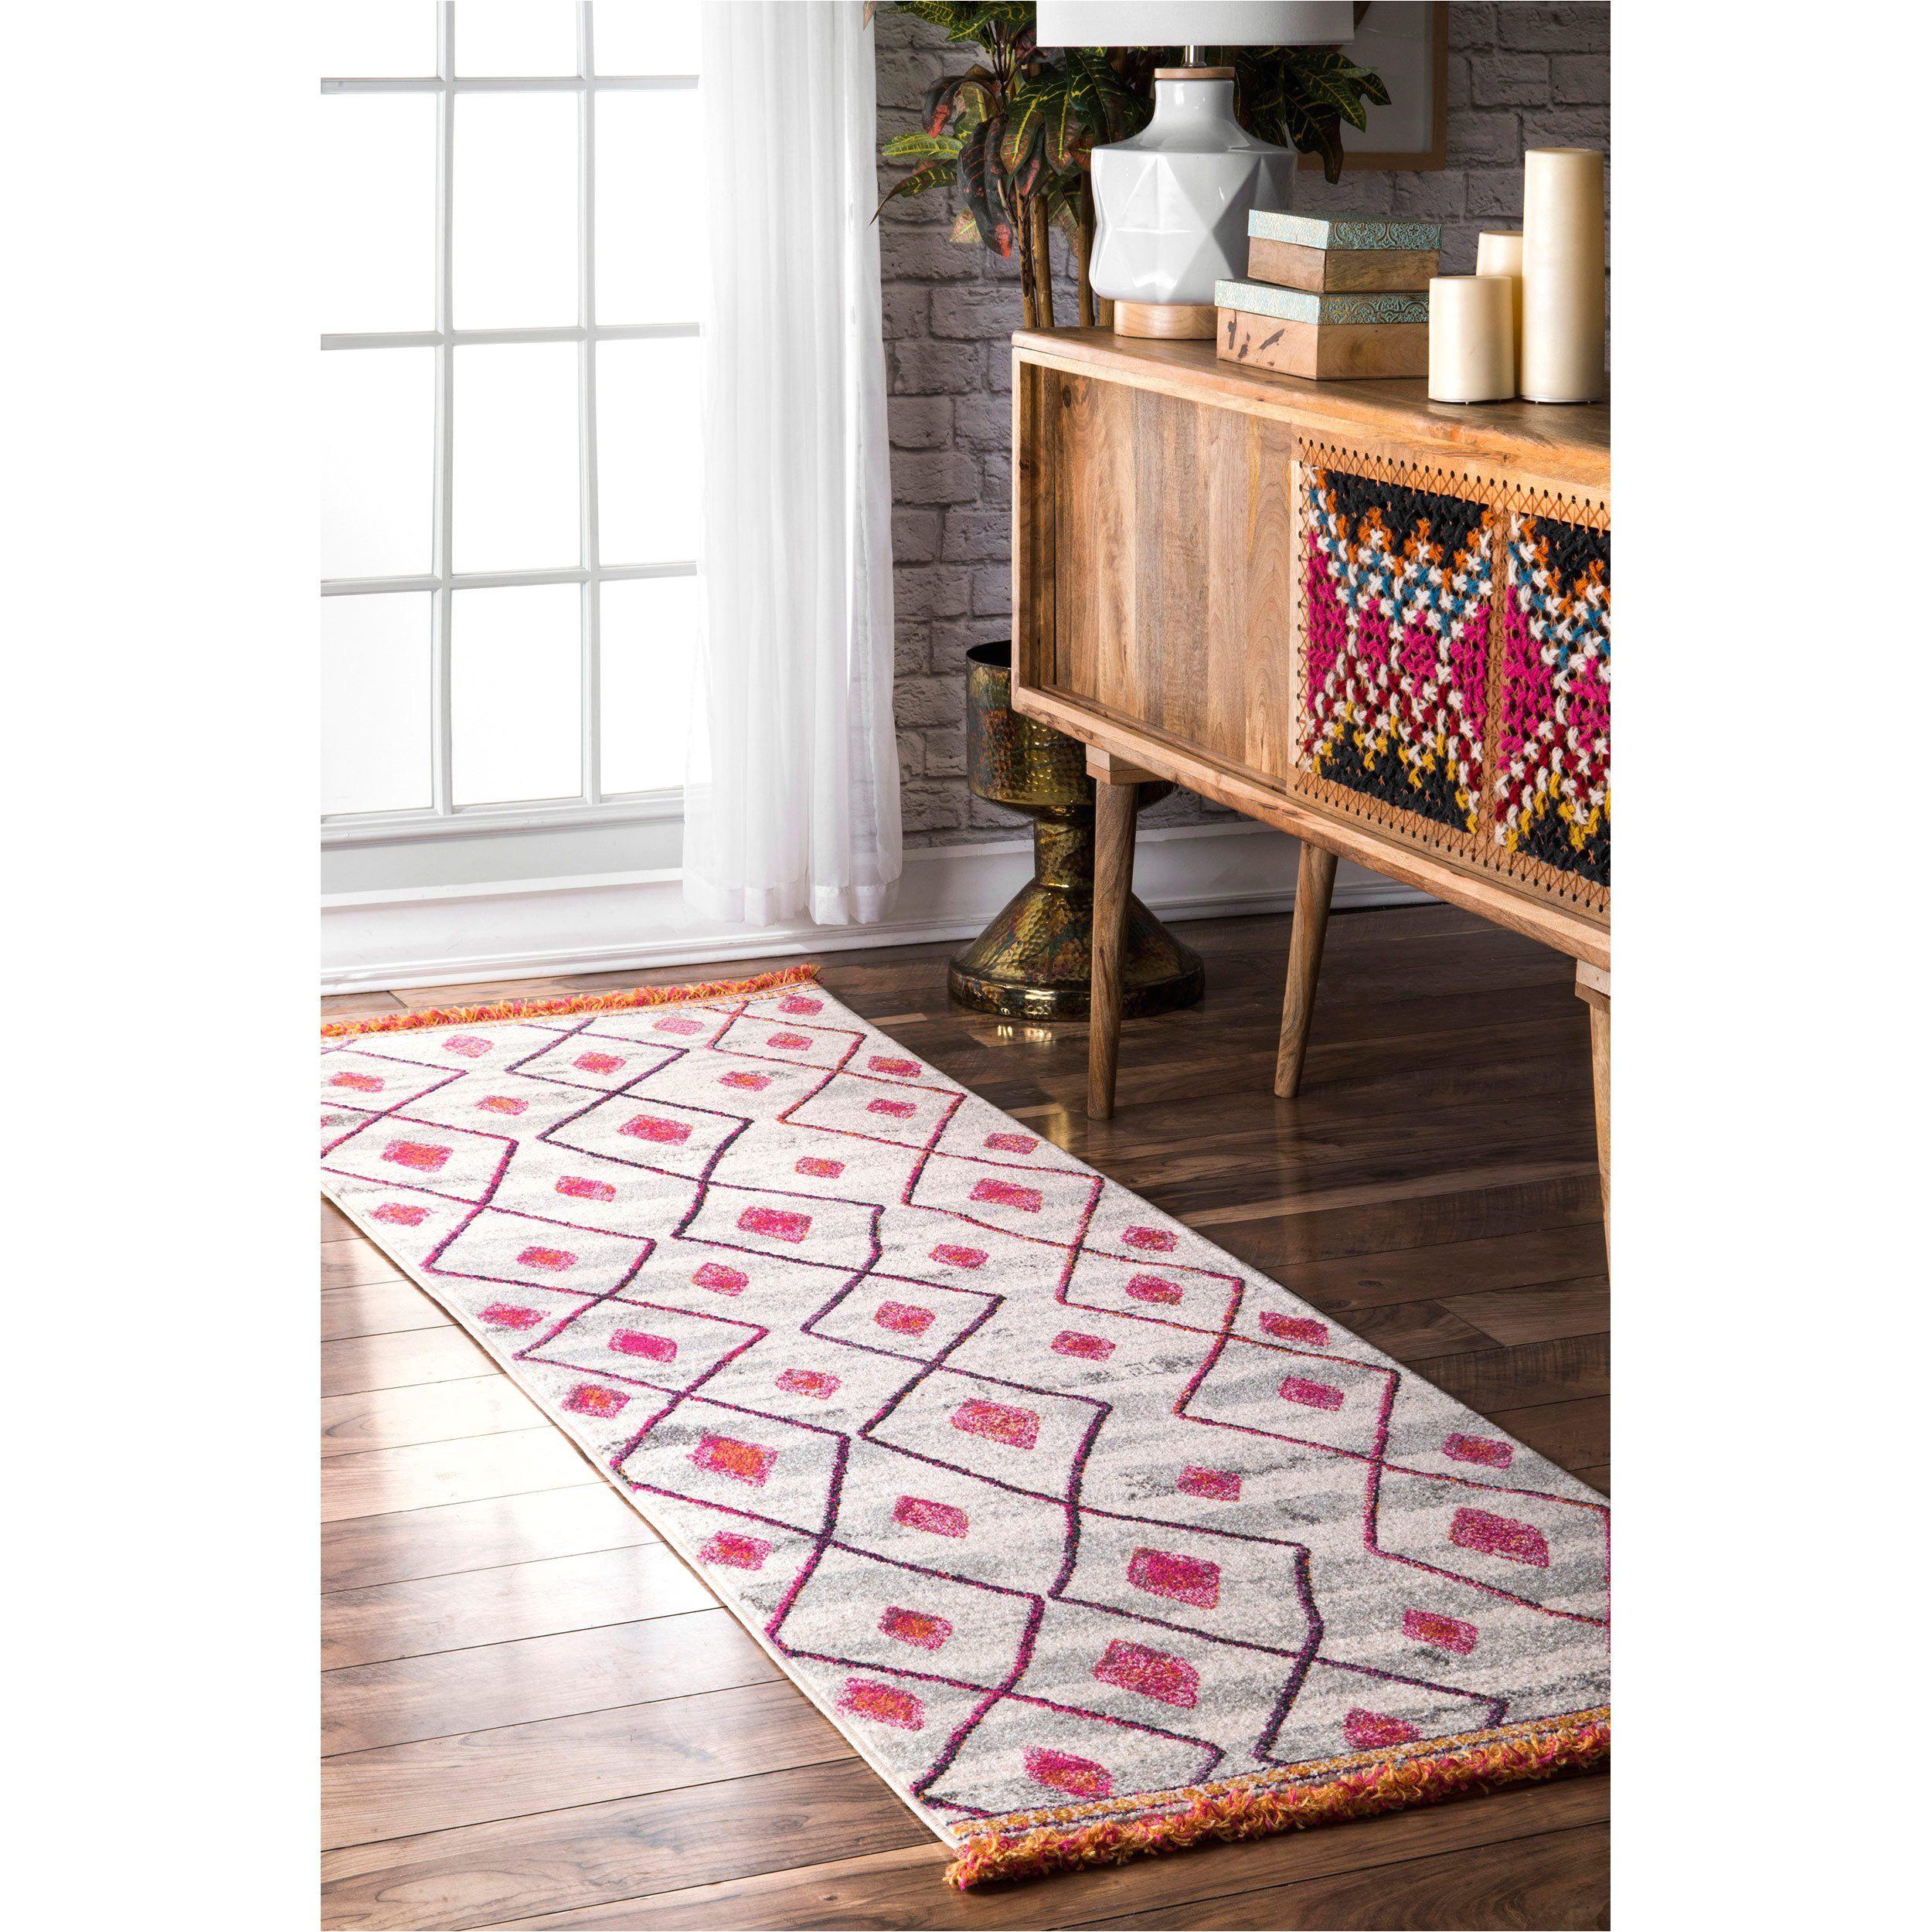 melissa moraccoa trellis rugs usa buy rugs online home decor stores trellis